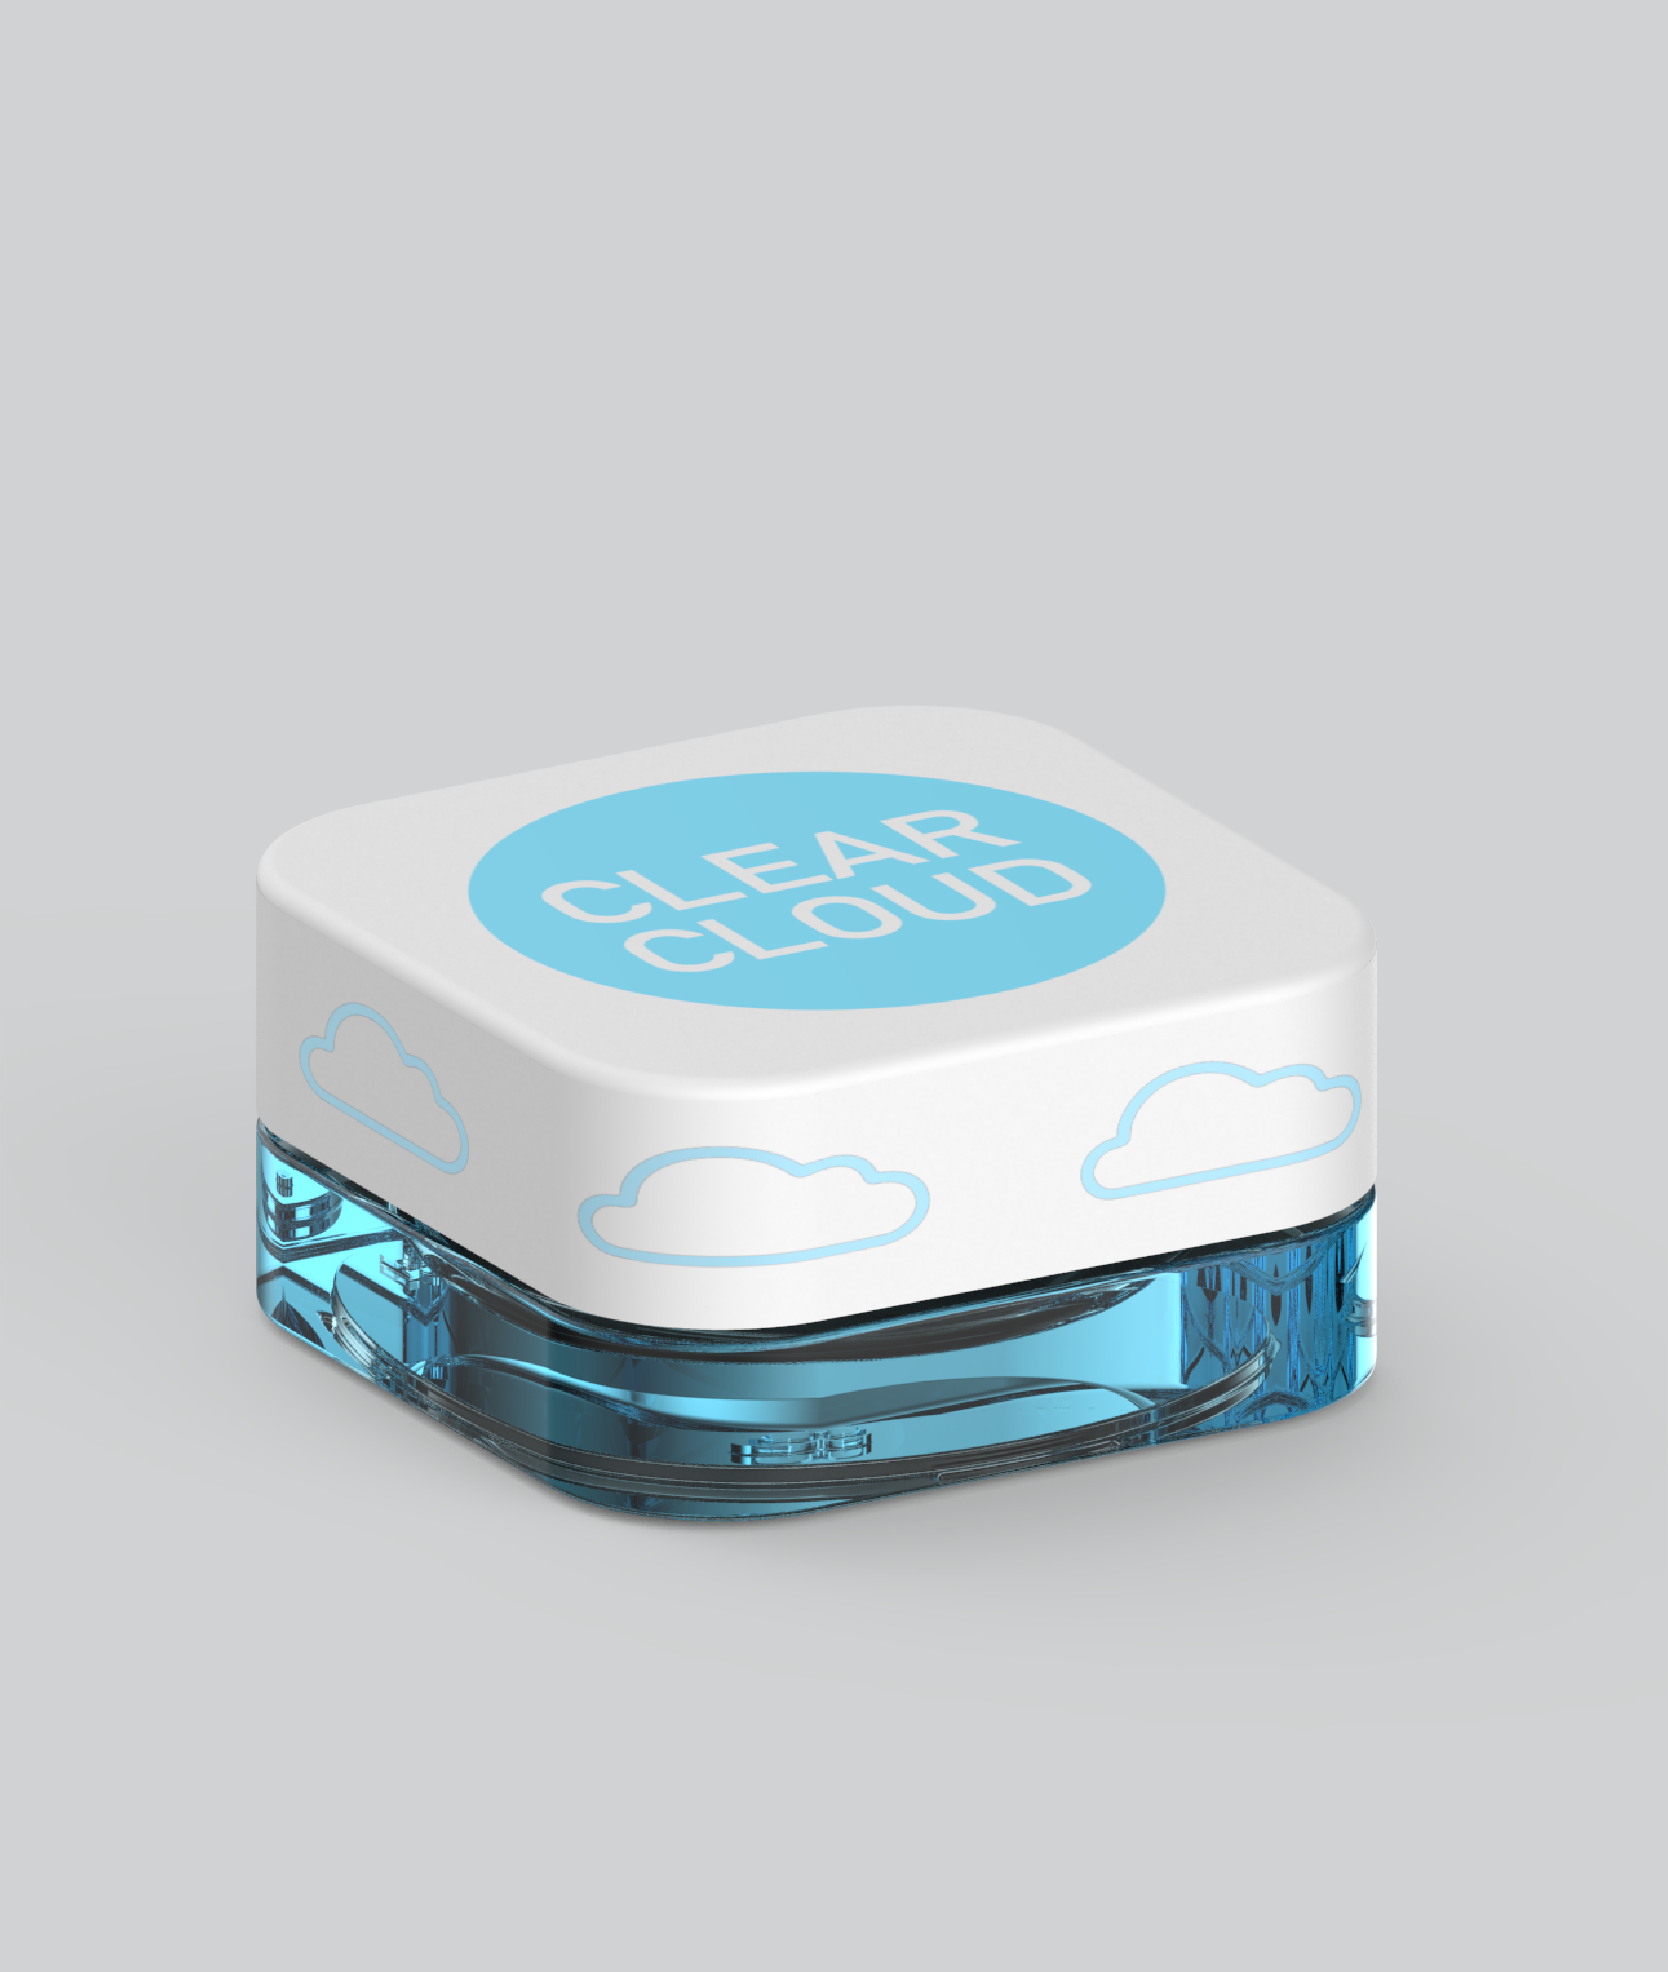 clear-cloud-custom-softsquare-square-jars